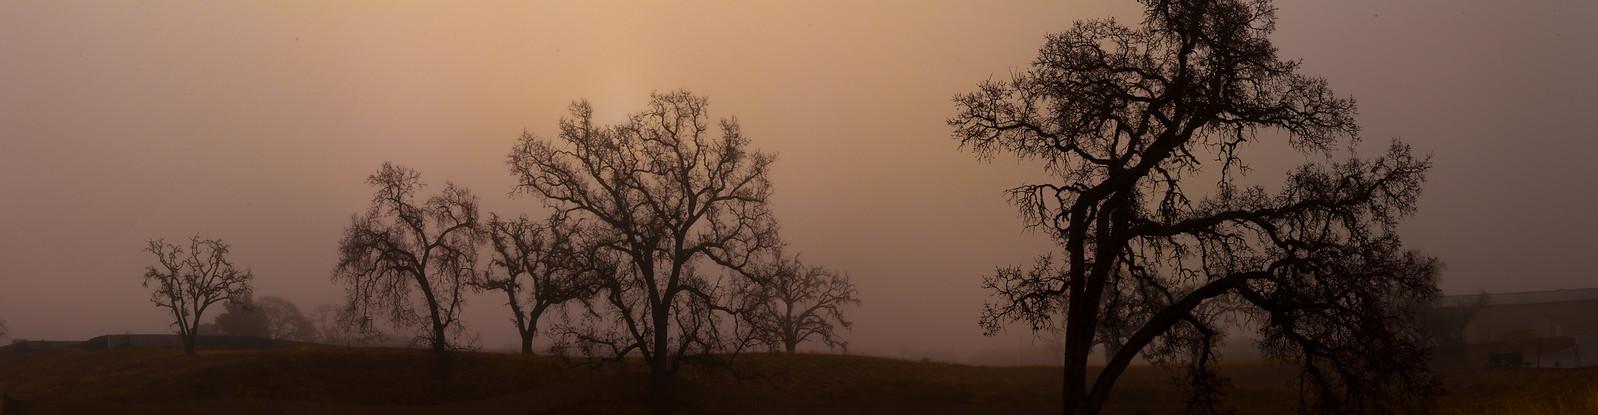 Trees in the morning fog